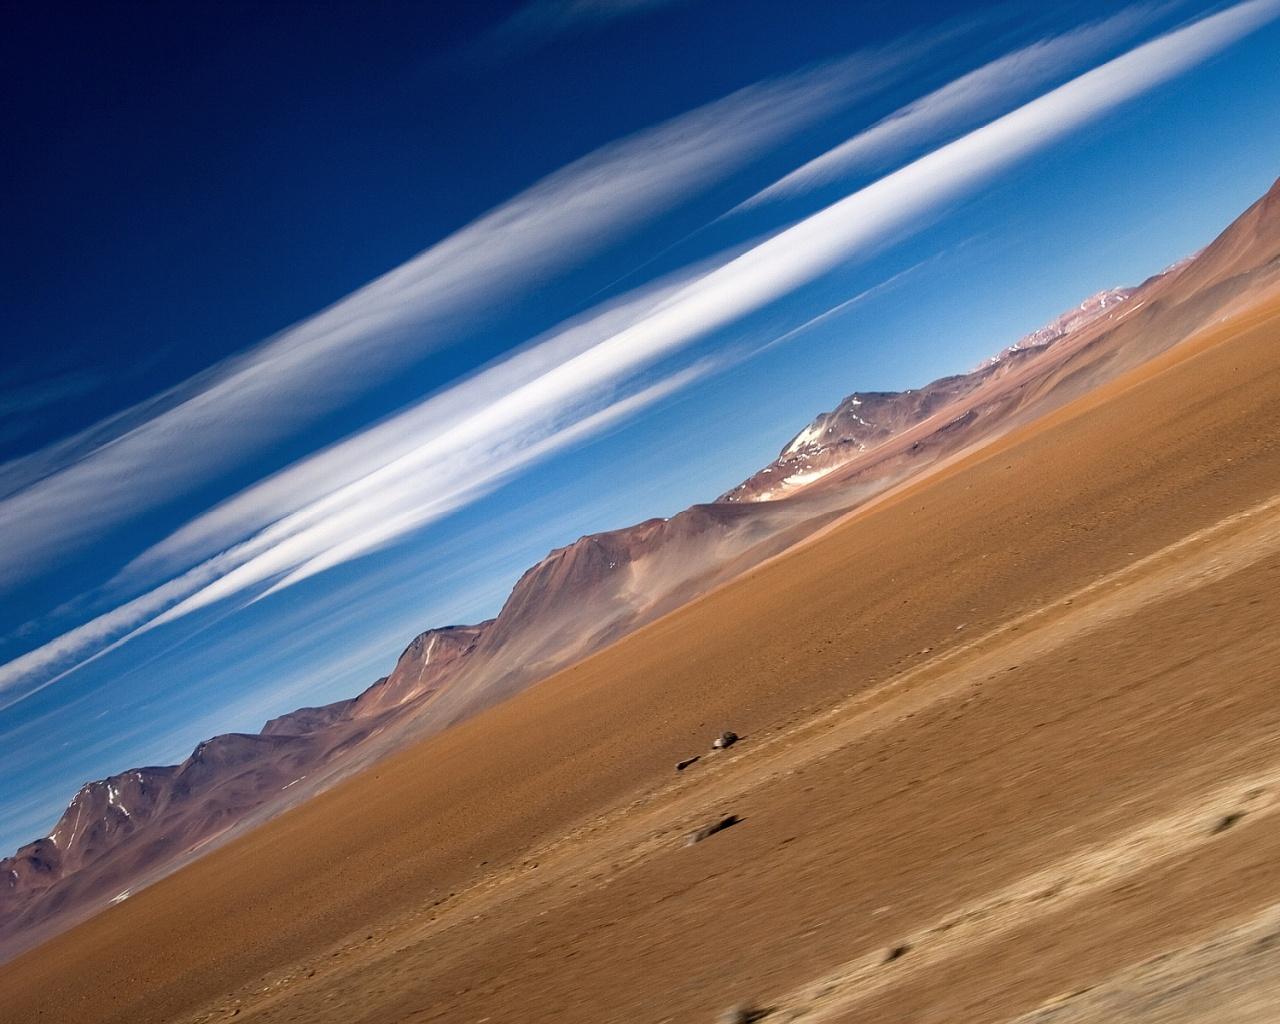 Desert argentina